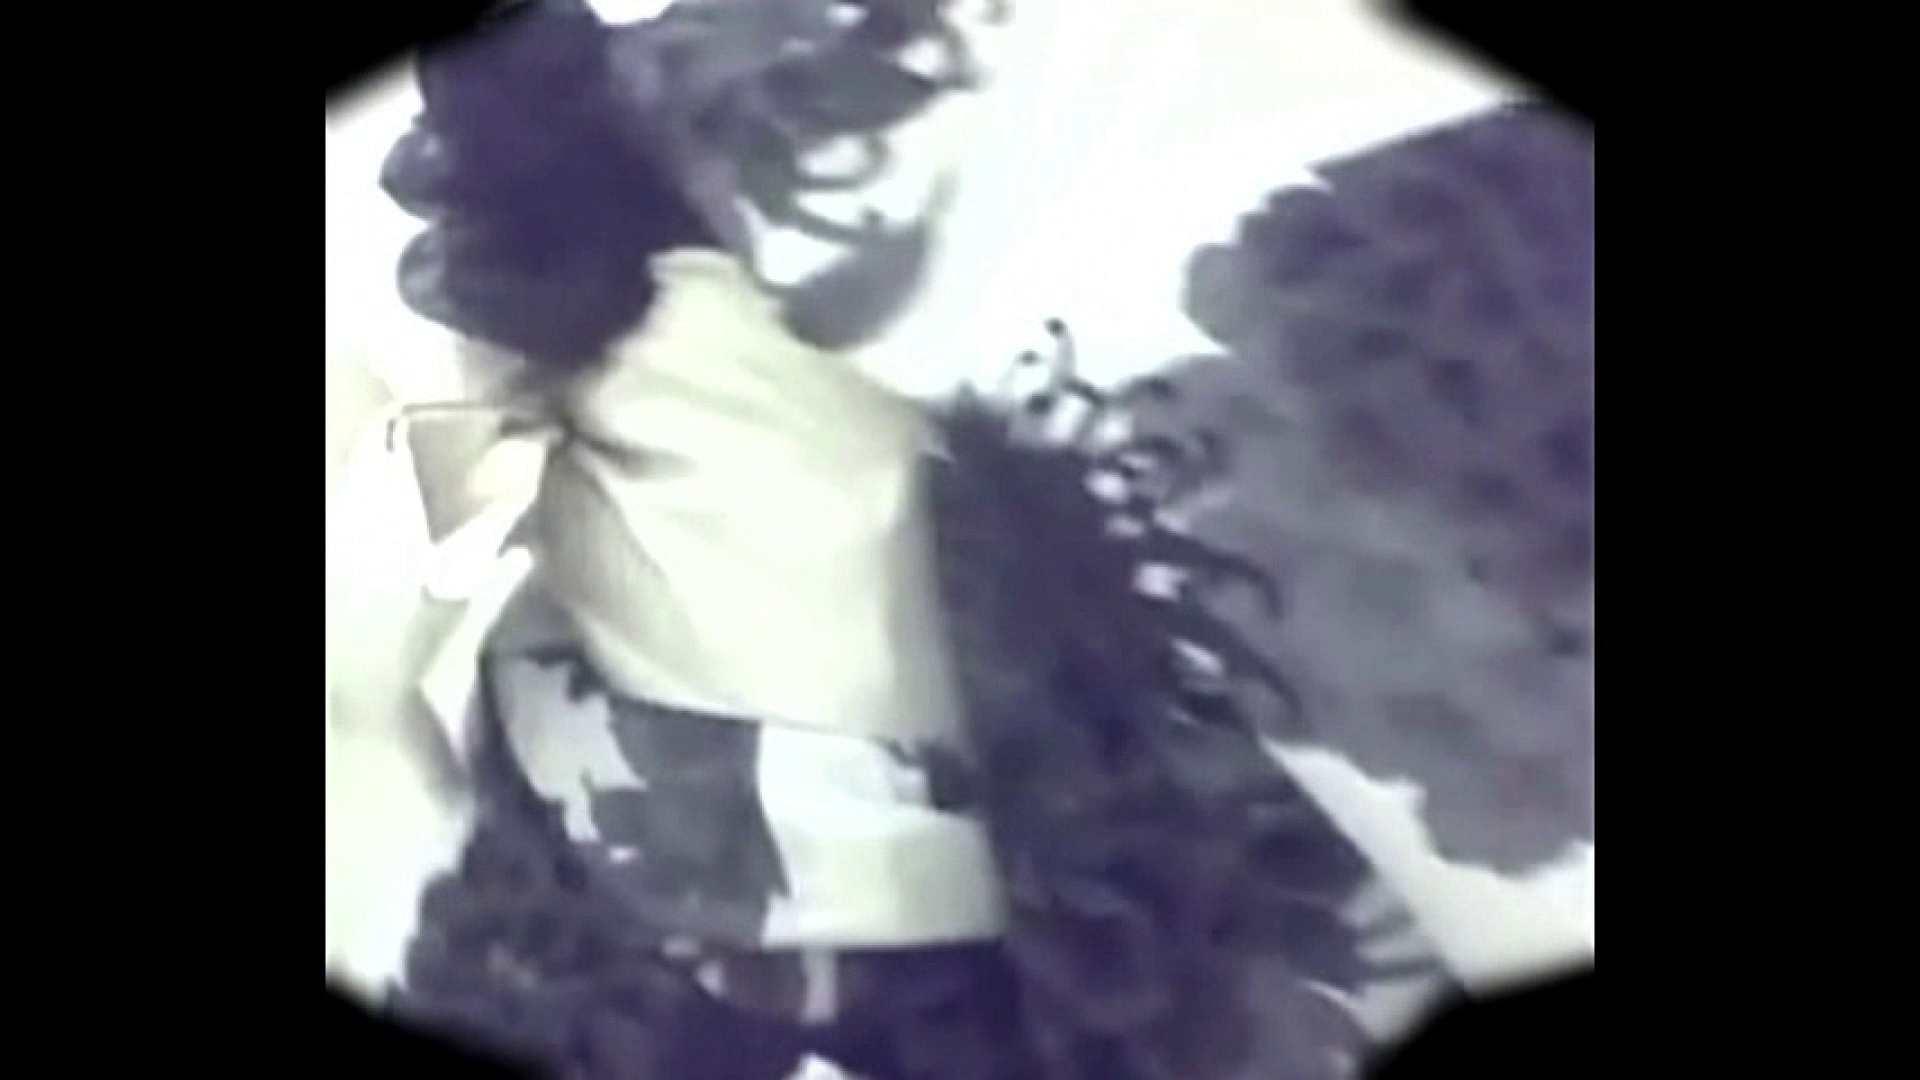 teen galトイレ覗き紙がナイ編‼vol.01 OLのエロ生活 盗み撮り動画キャプチャ 42連発 30